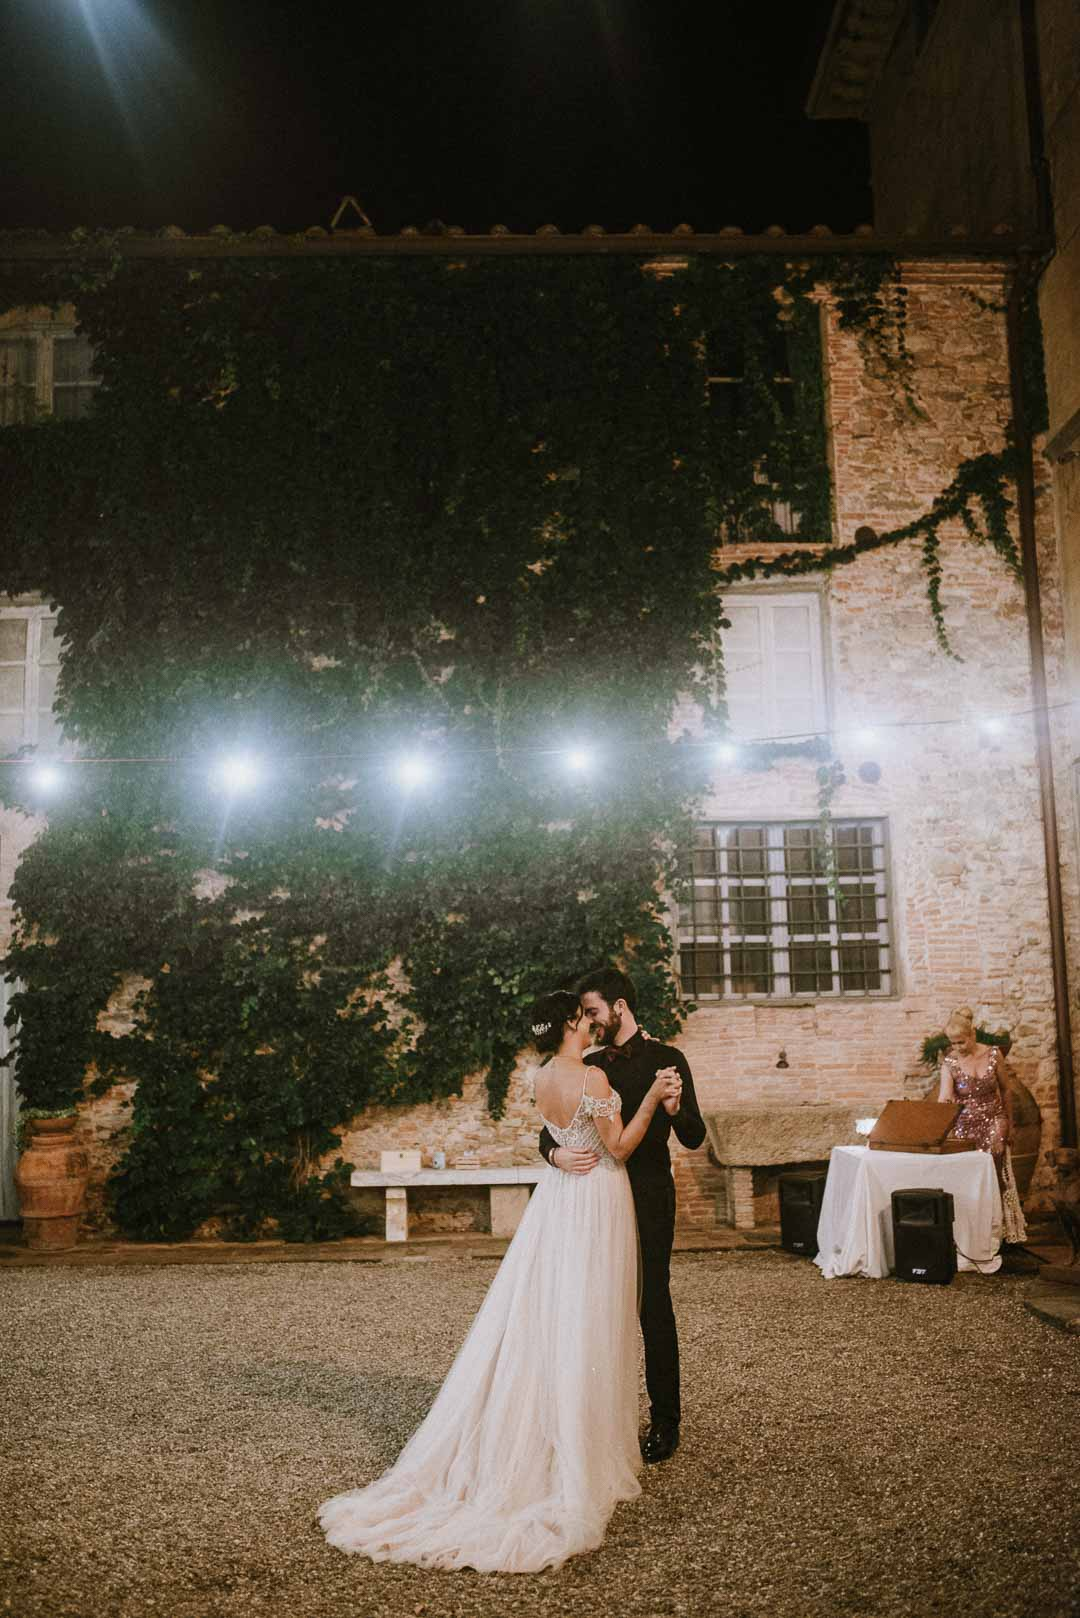 wedding-photographer-destination-fineart-bespoke-reportage-tuscany-villascorzi-vivianeizzo-spazio46-183